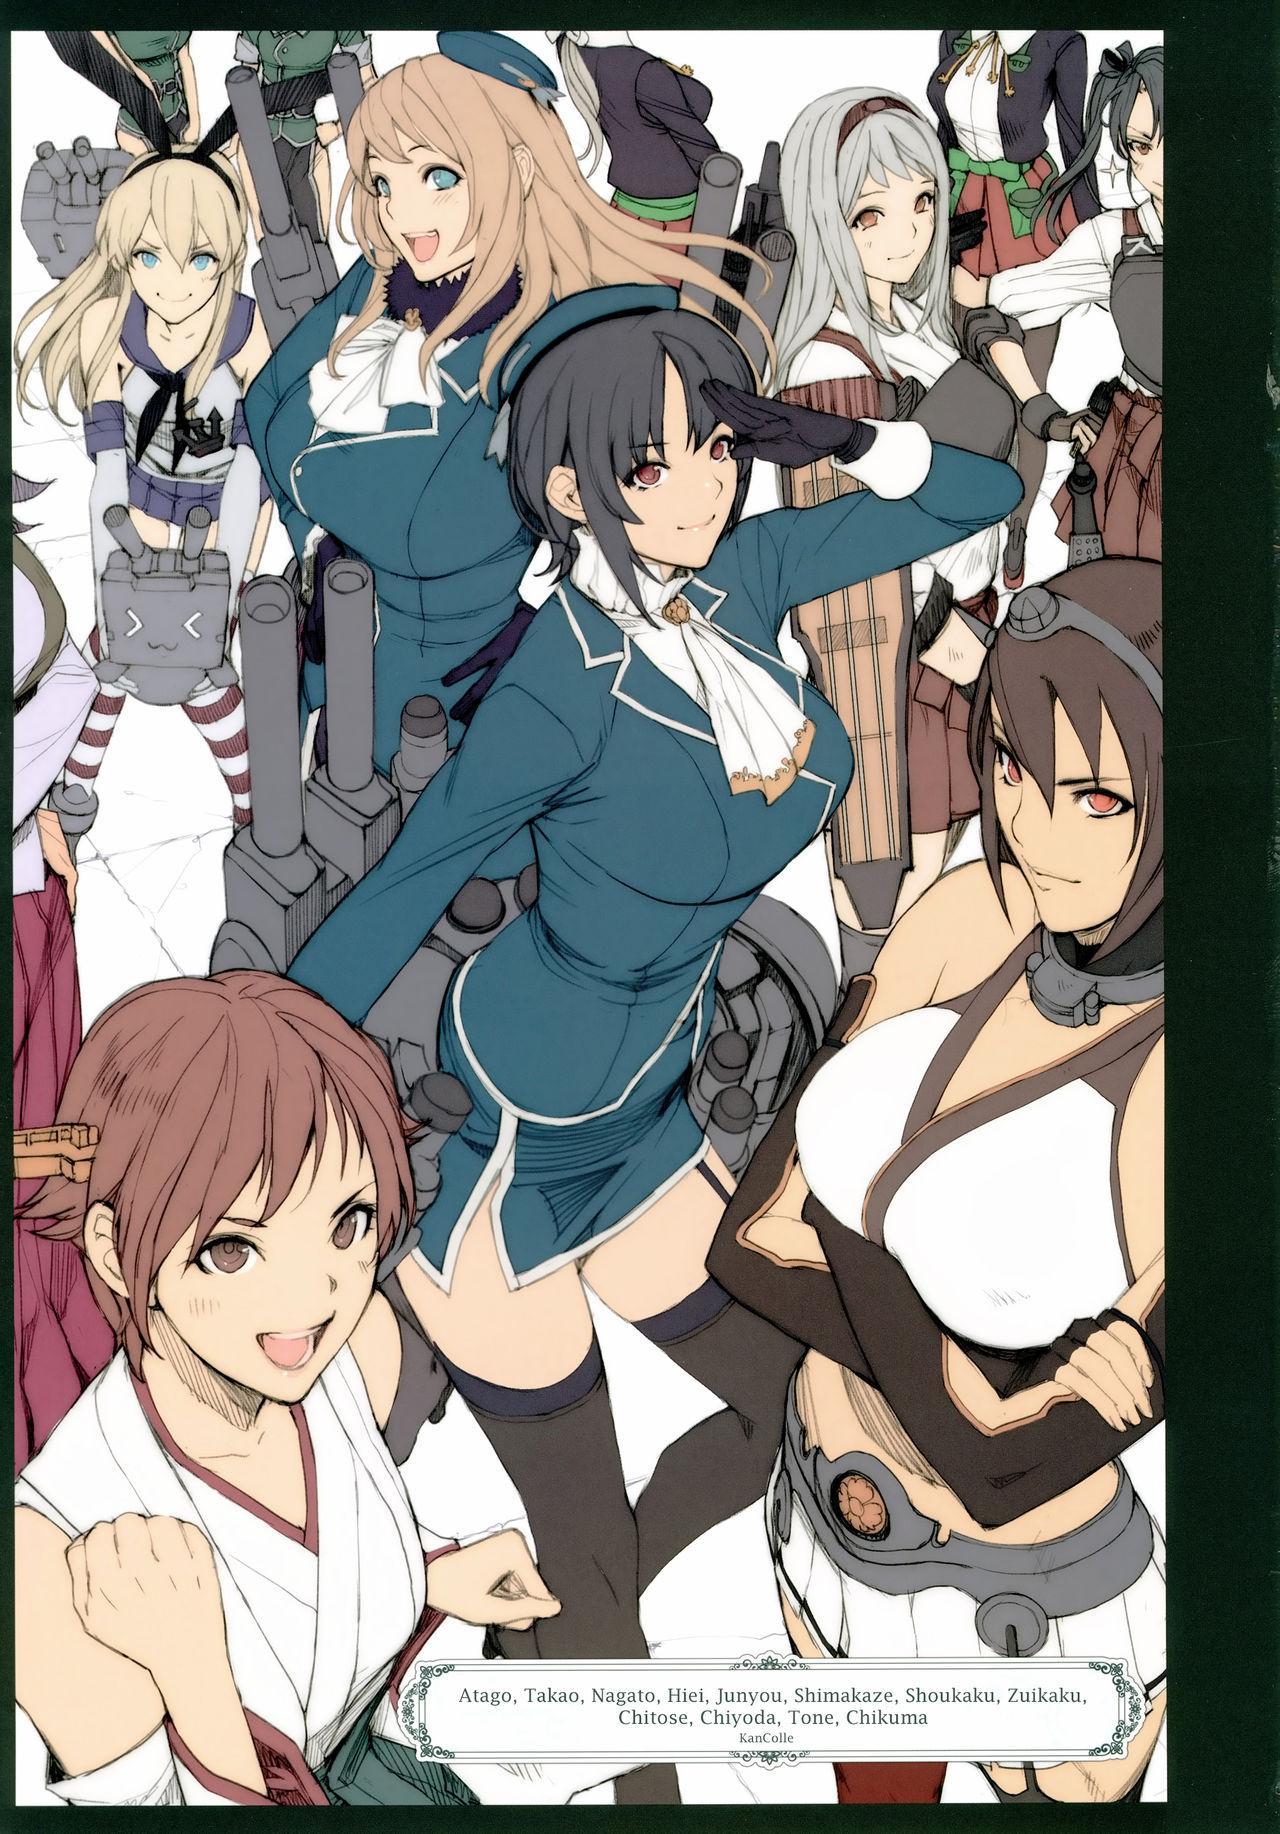 H na Toshiue Chara no Rakugaki - Rough Manga Hon | A Collection of Sketches and Rough Manga of Hot MILFs 1